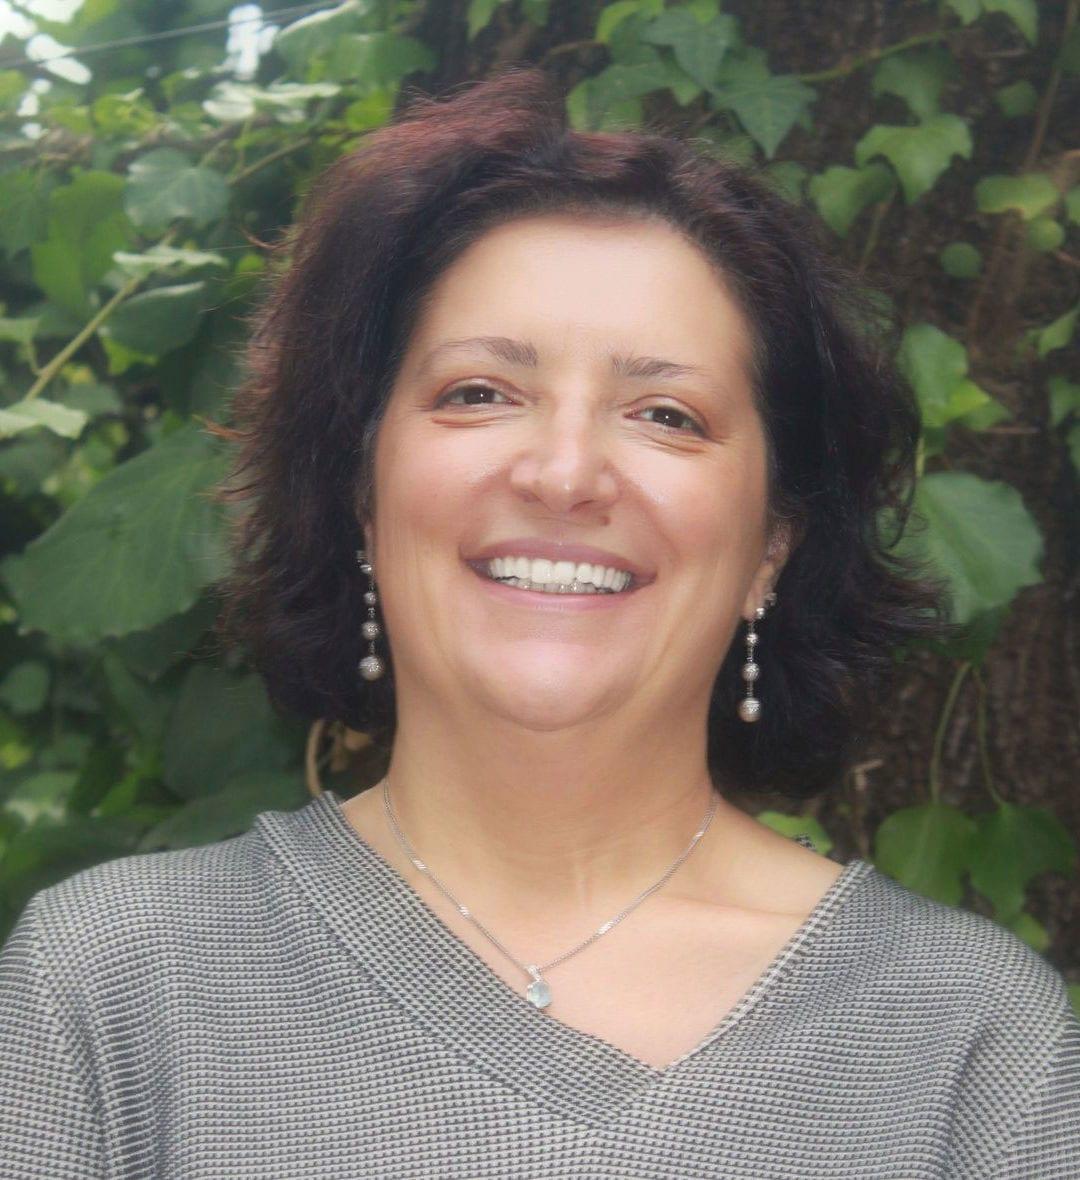 Maria Beatrice Dall'Omo